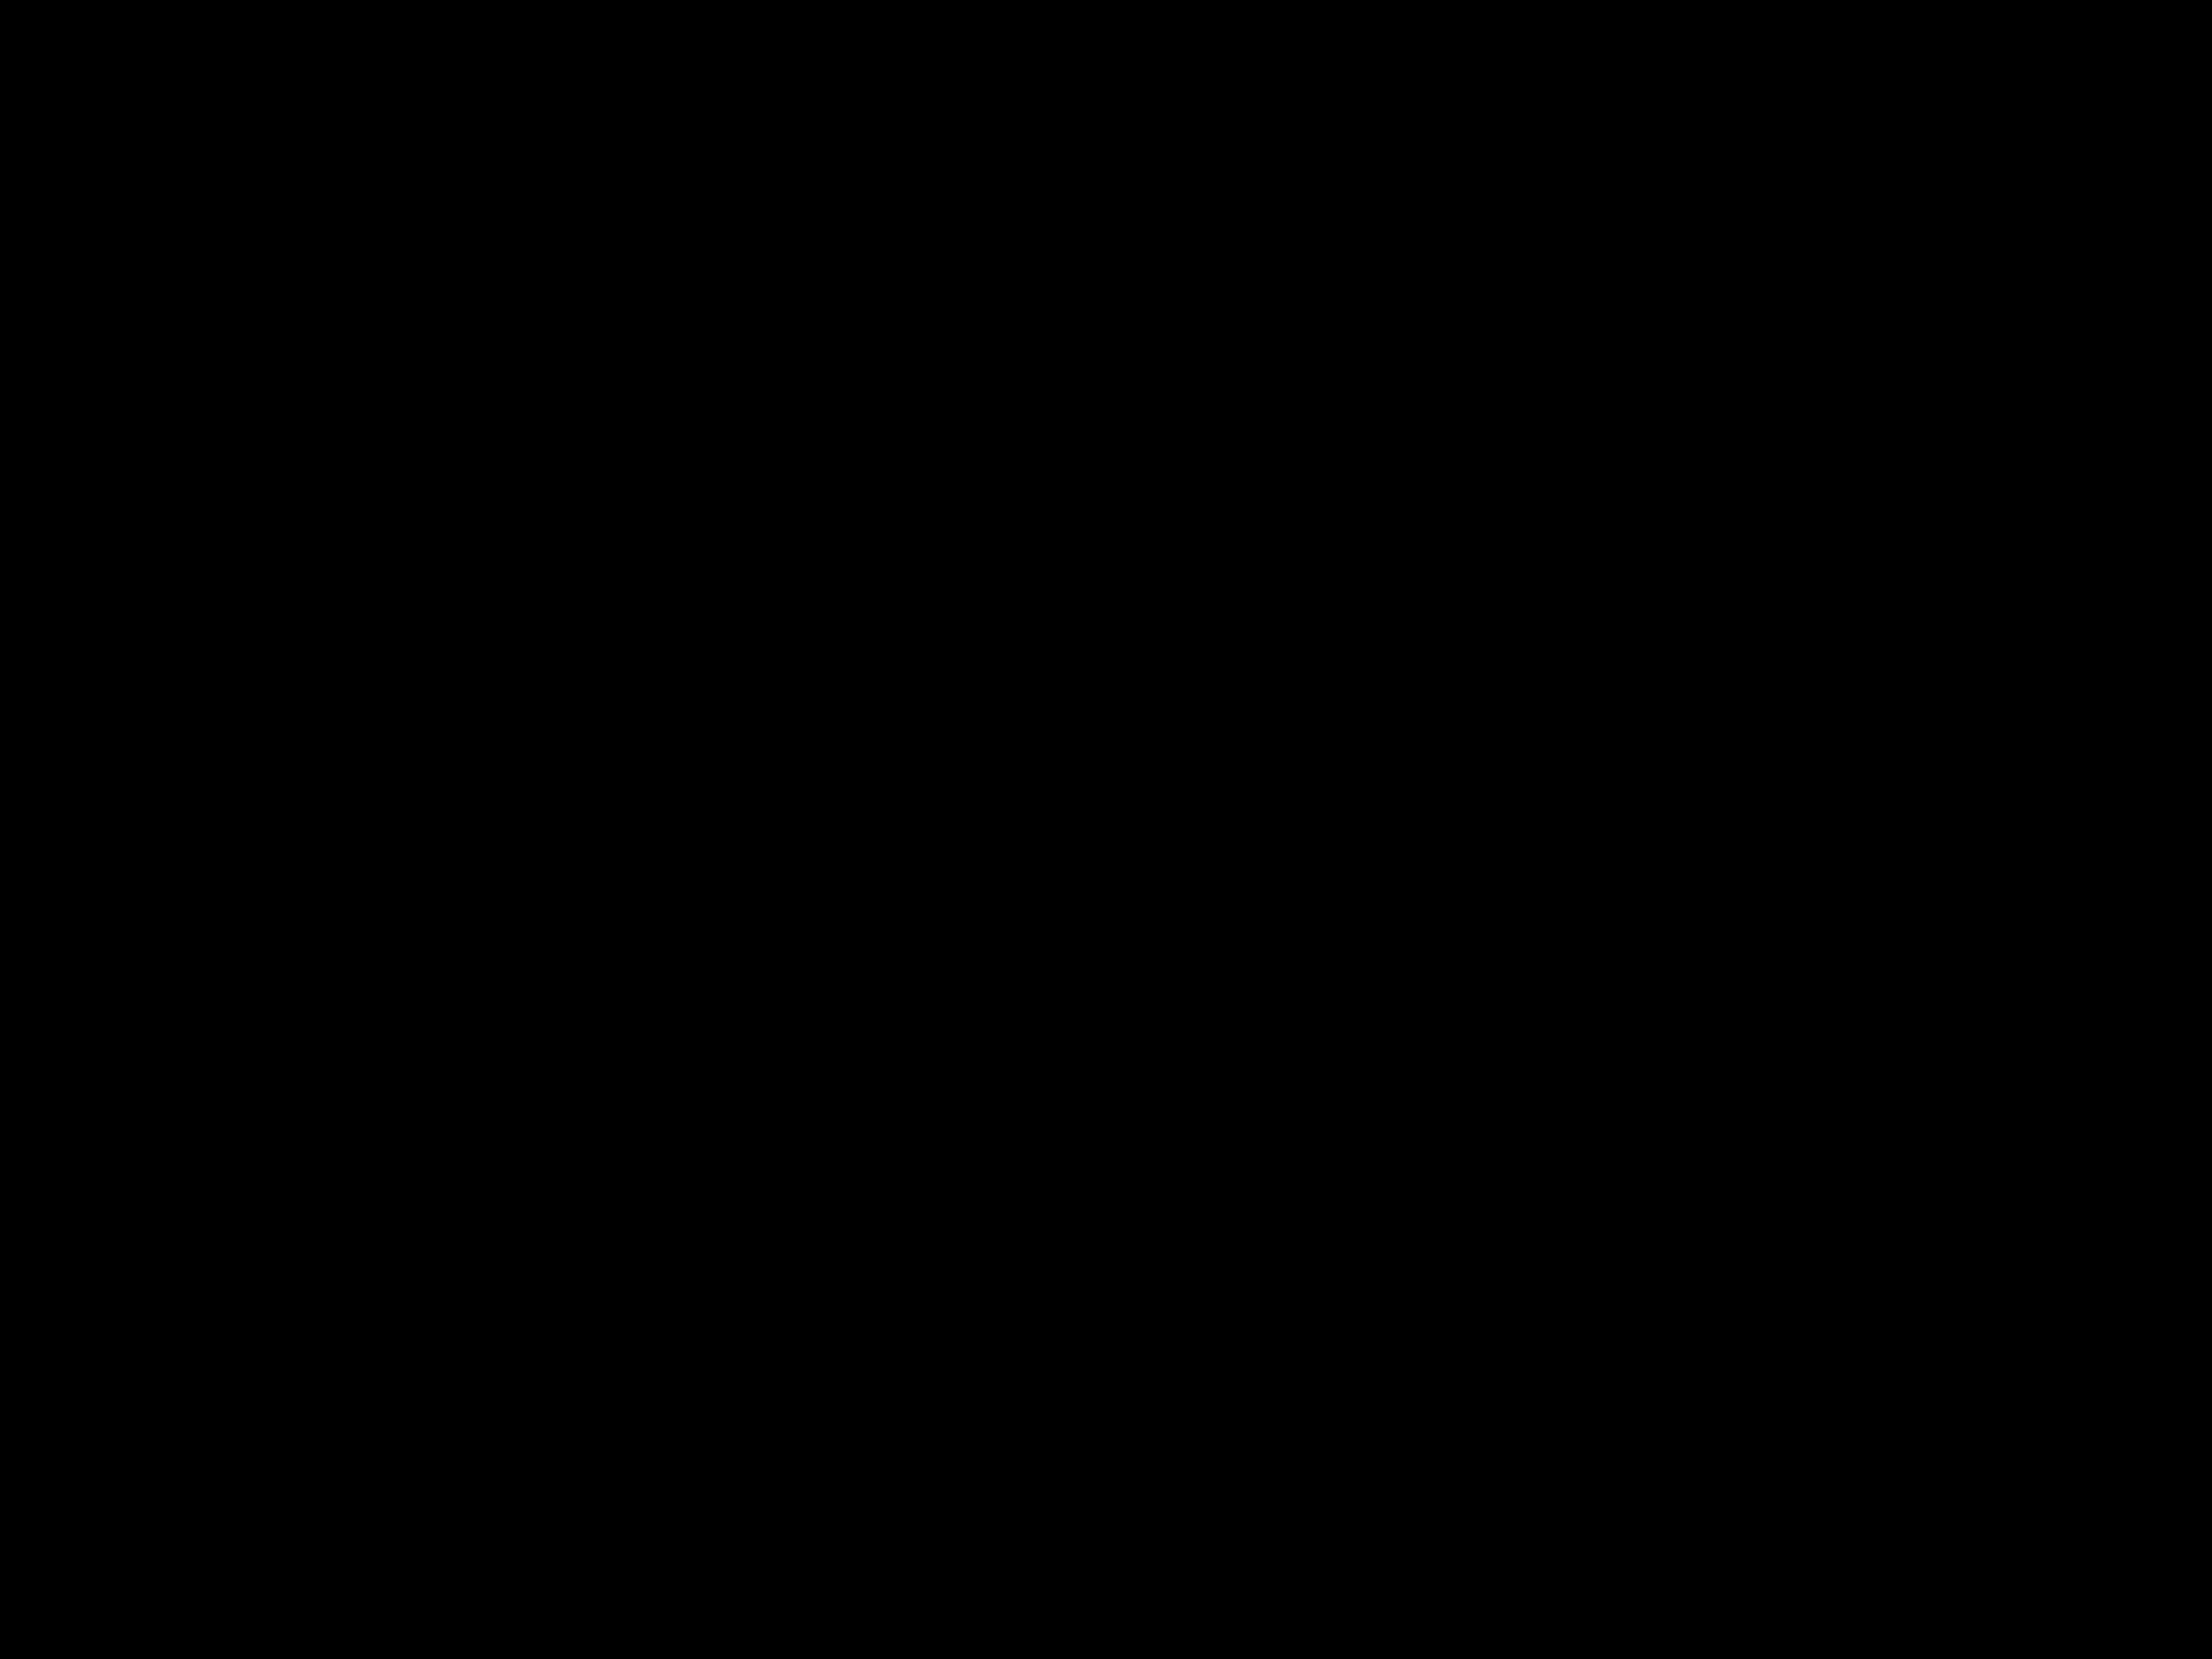 100_5385